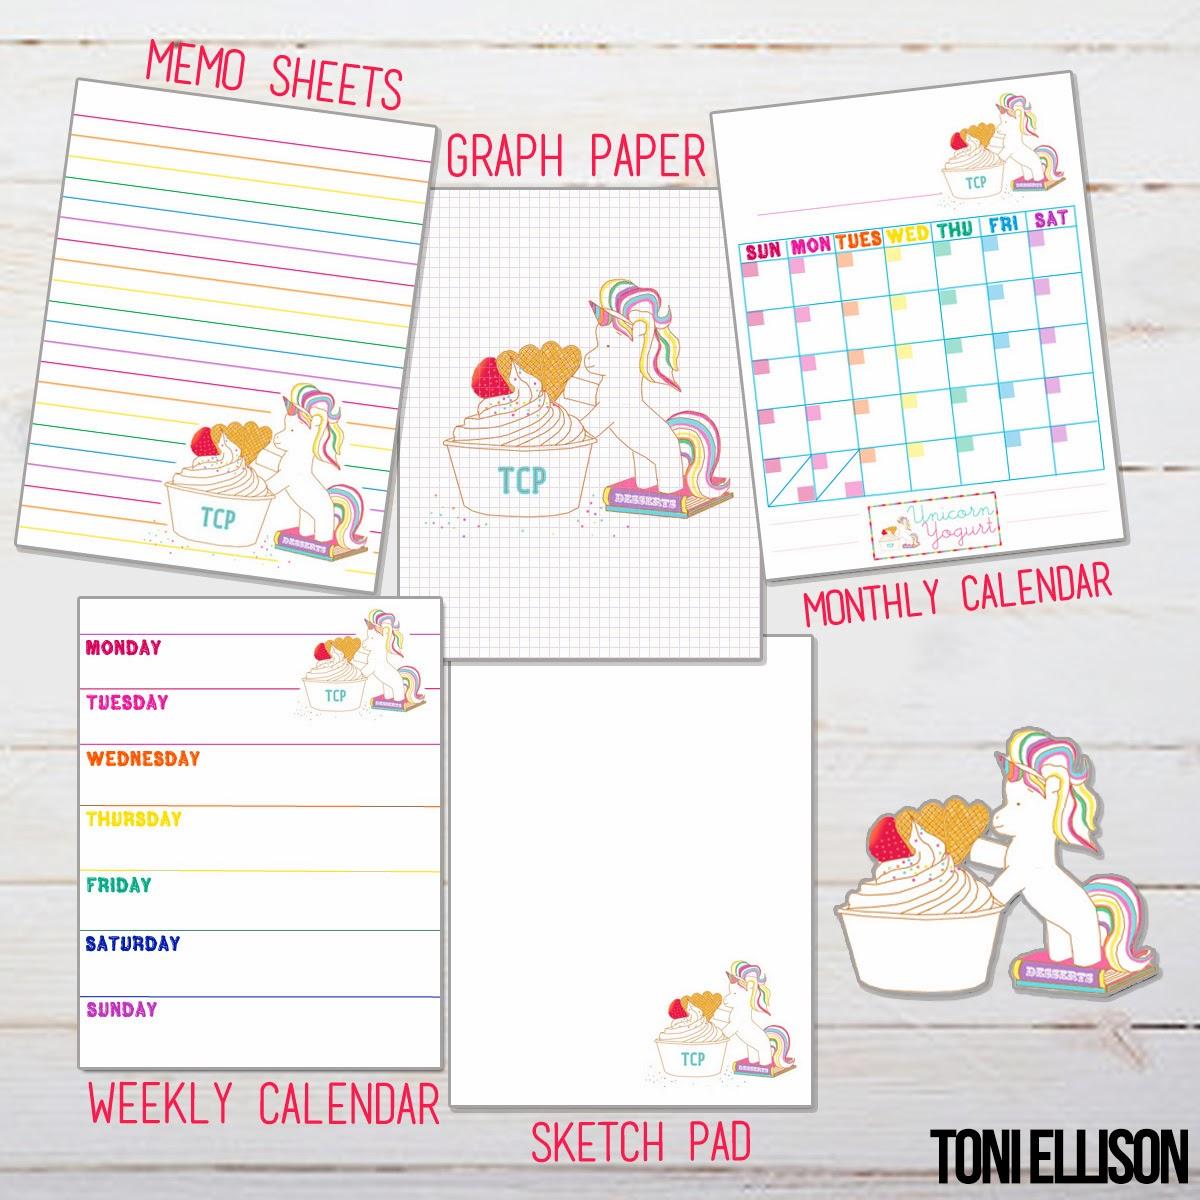 toni ellison  agenda - planner - stationery diy - how to make your own agenda